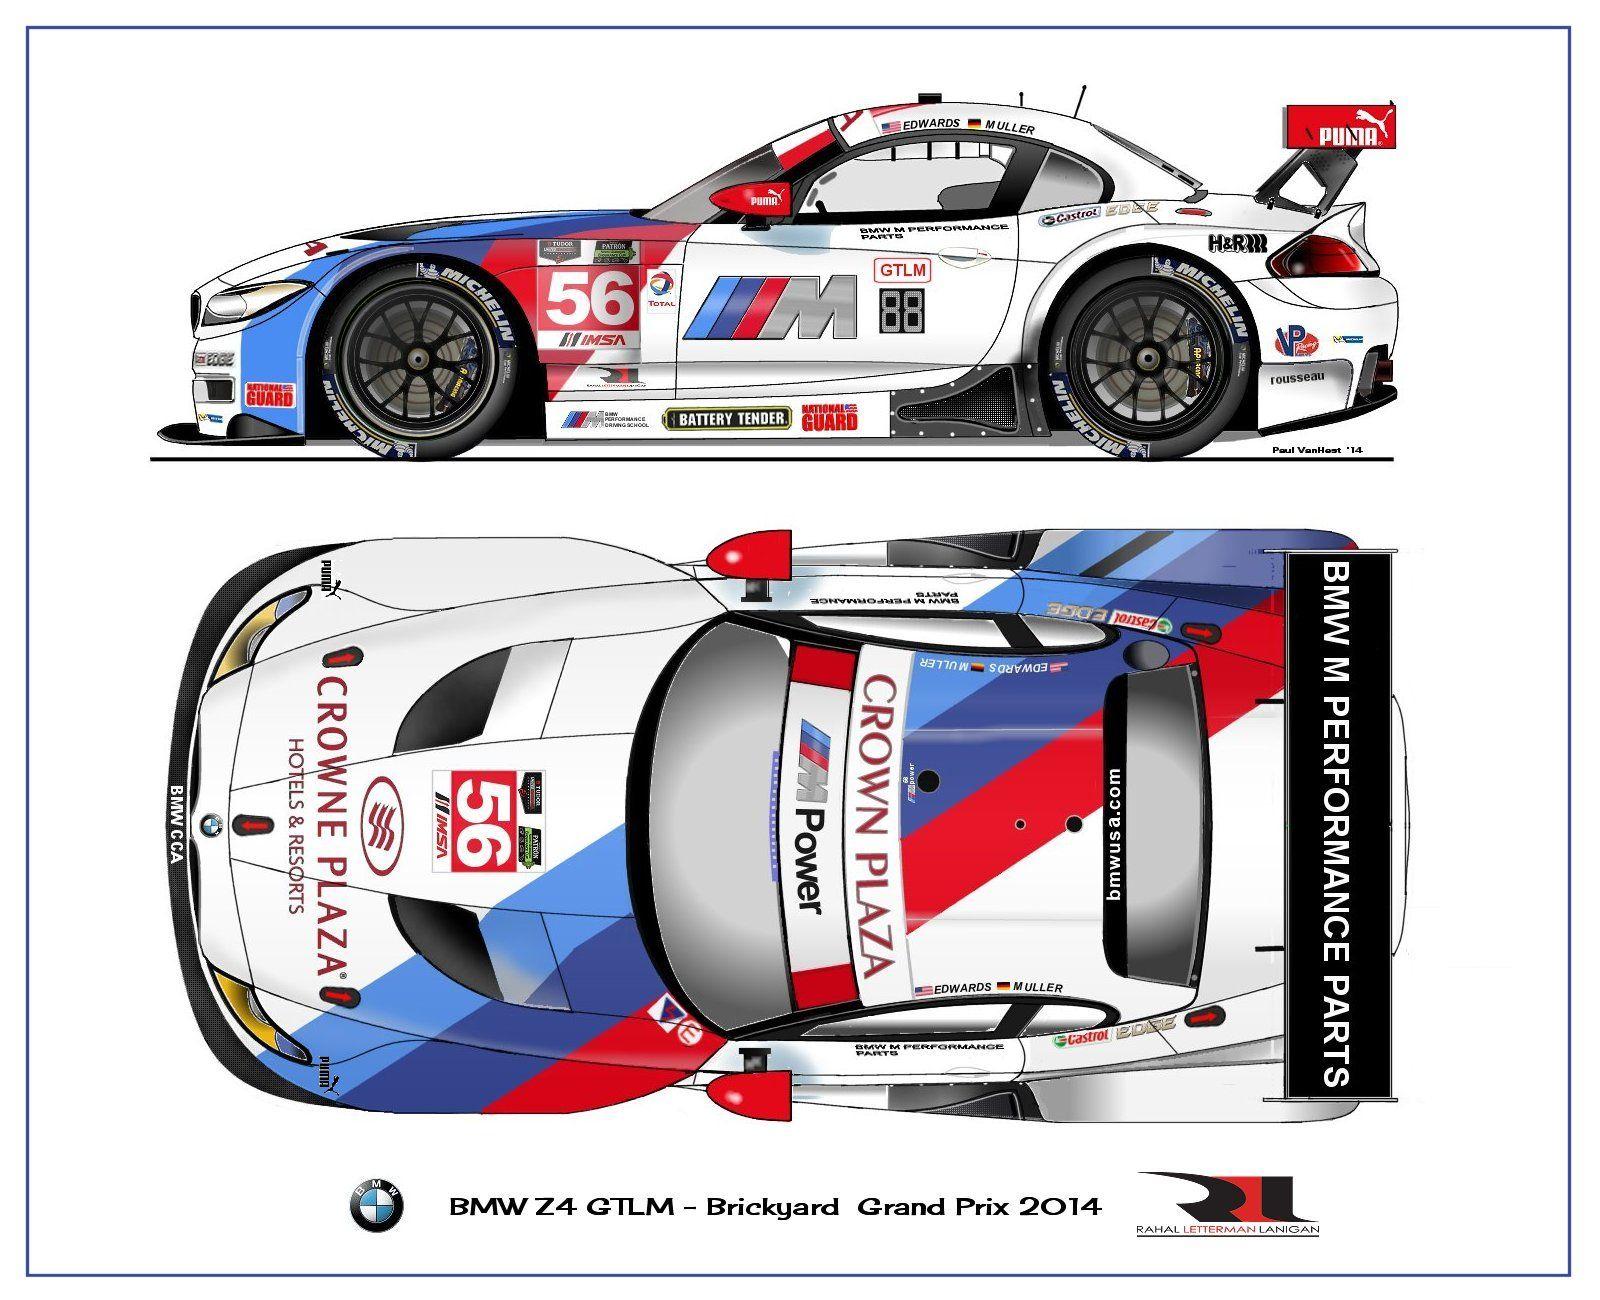 BMW Z4 GTLM 2014